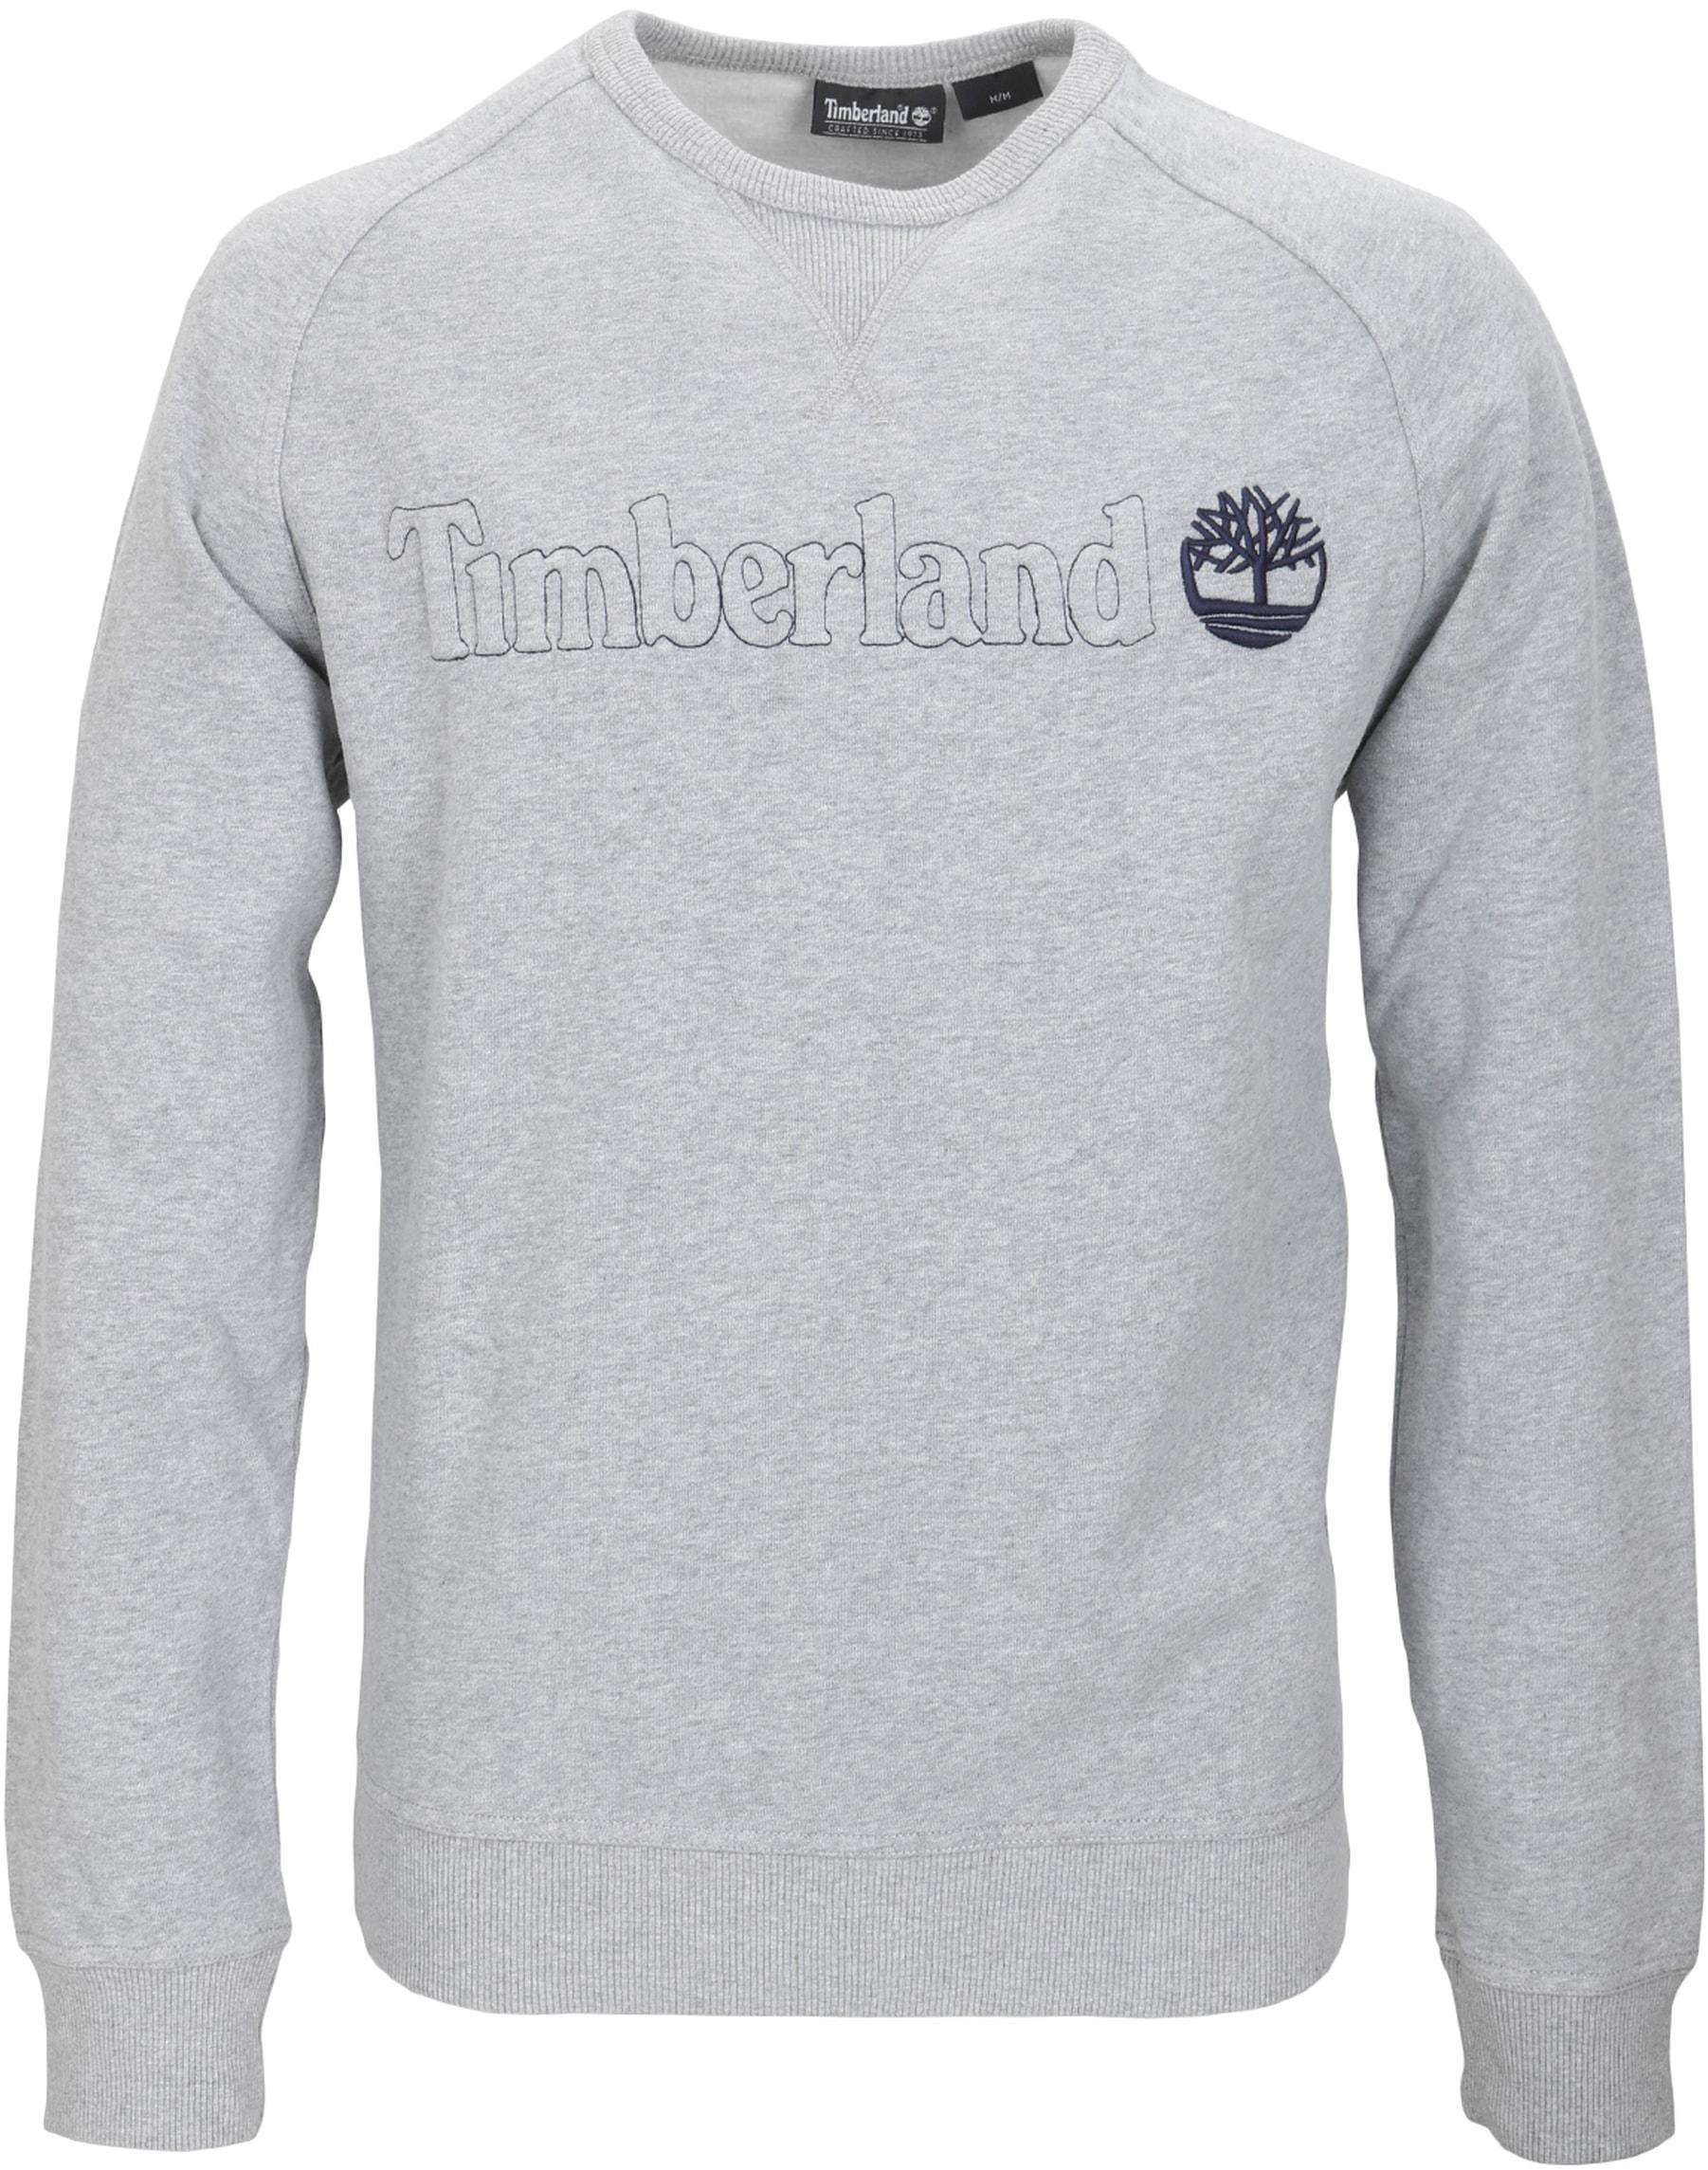 Timberland Sweatshirt Grau Raglan foto 0